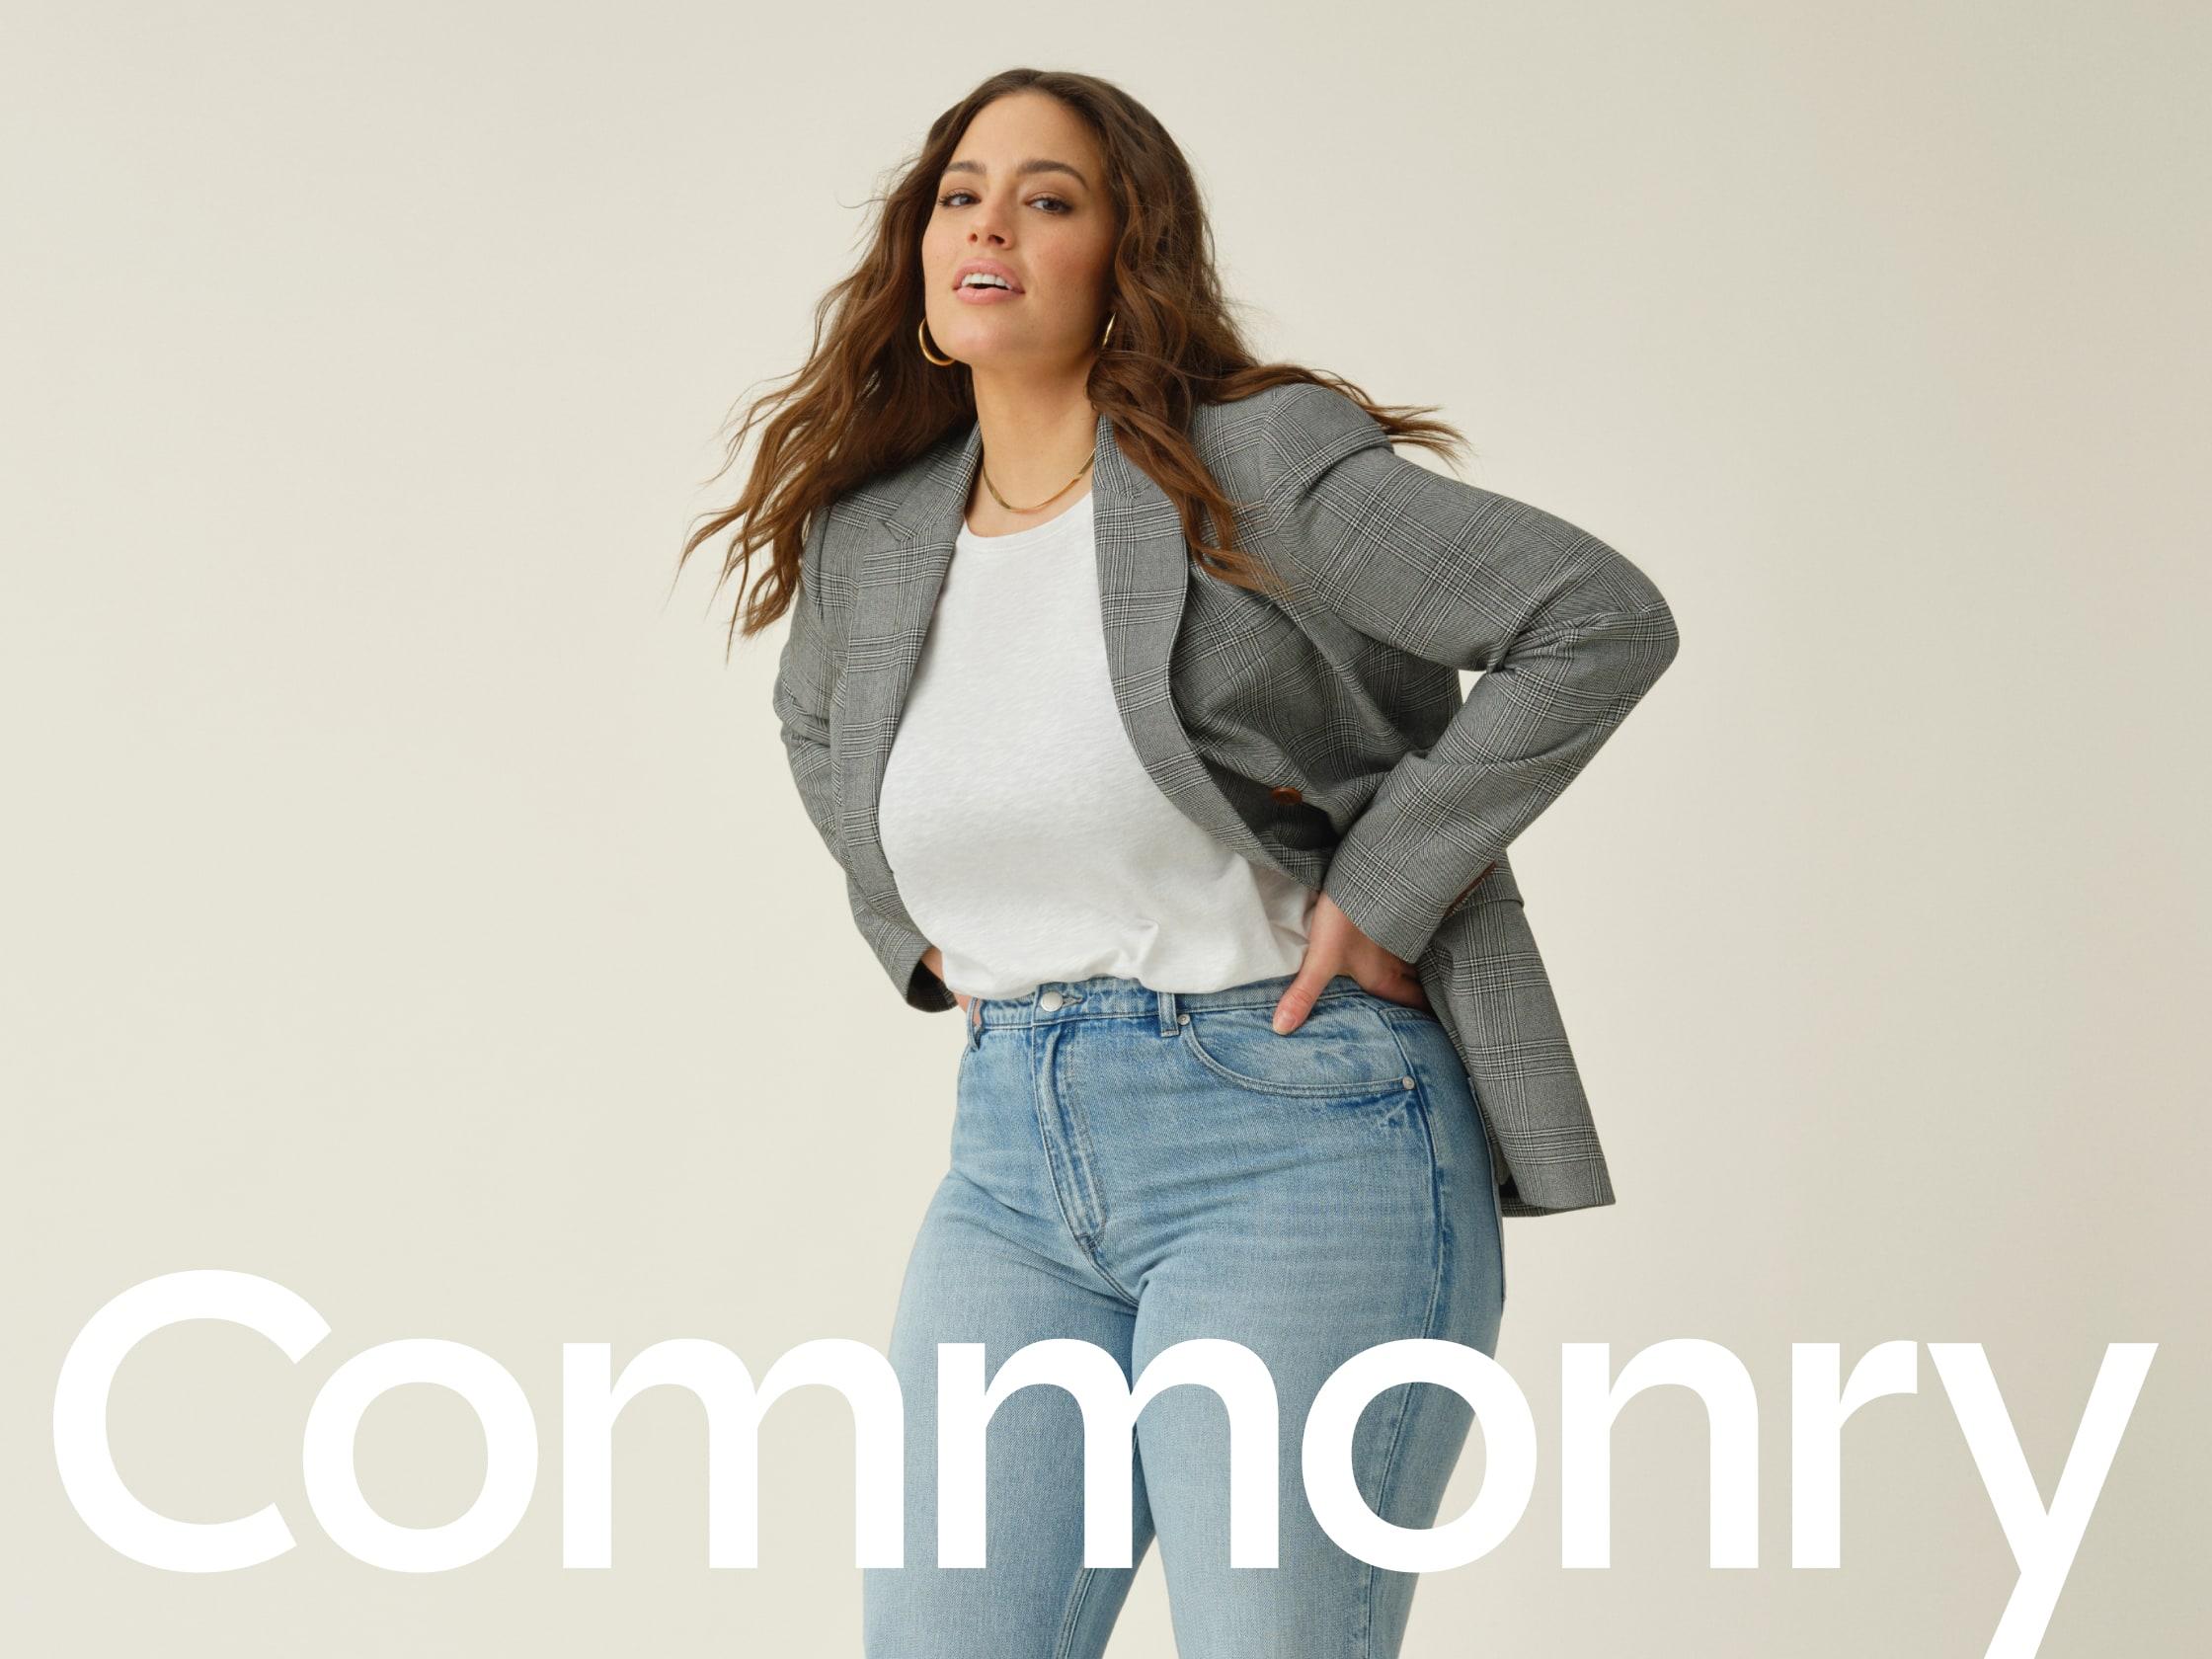 commonry-thumb